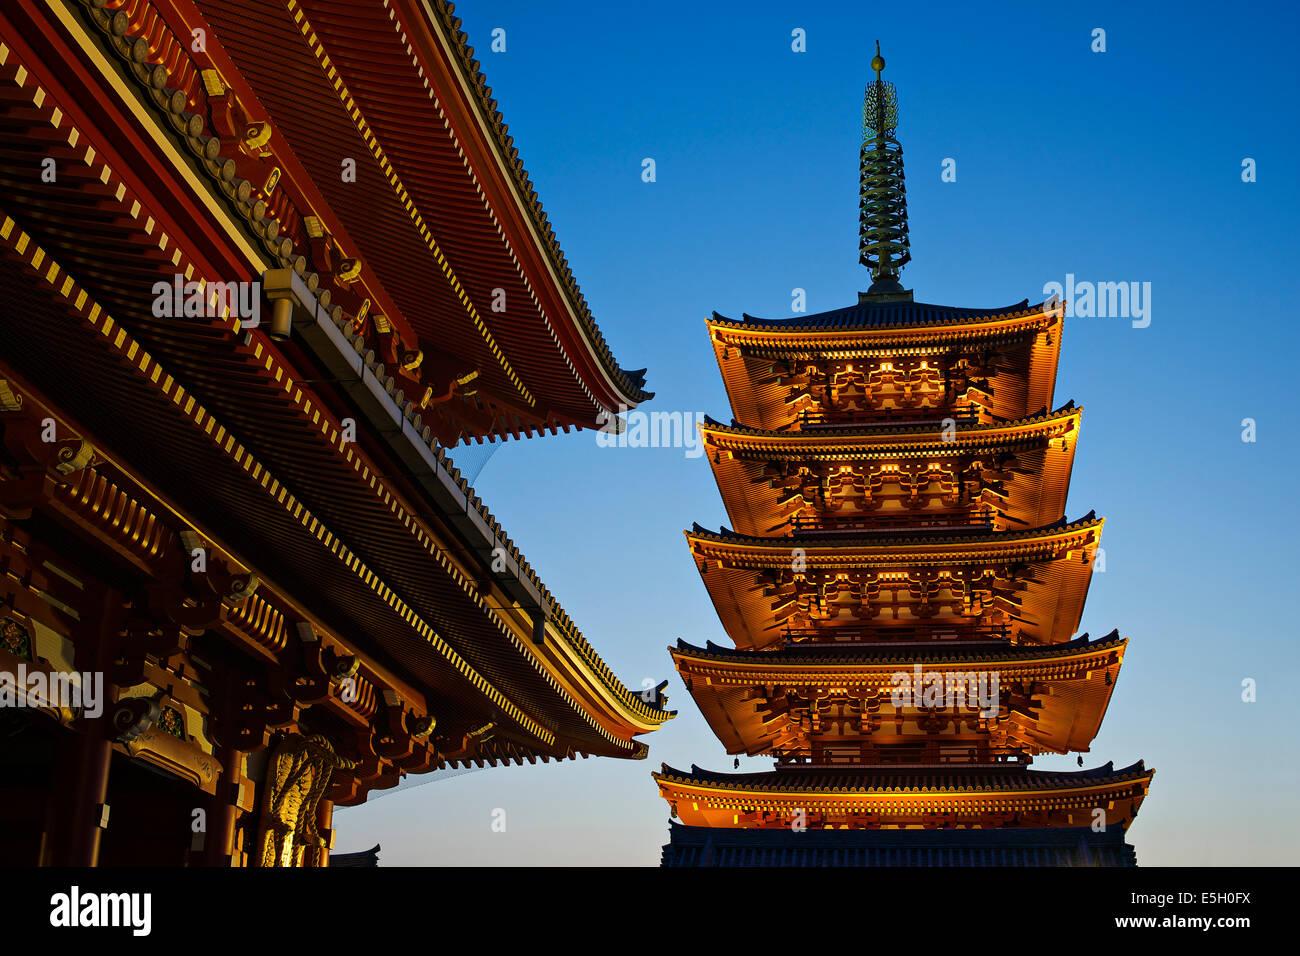 Senso-ji temple, Tokyo, Japan. - Stock Image